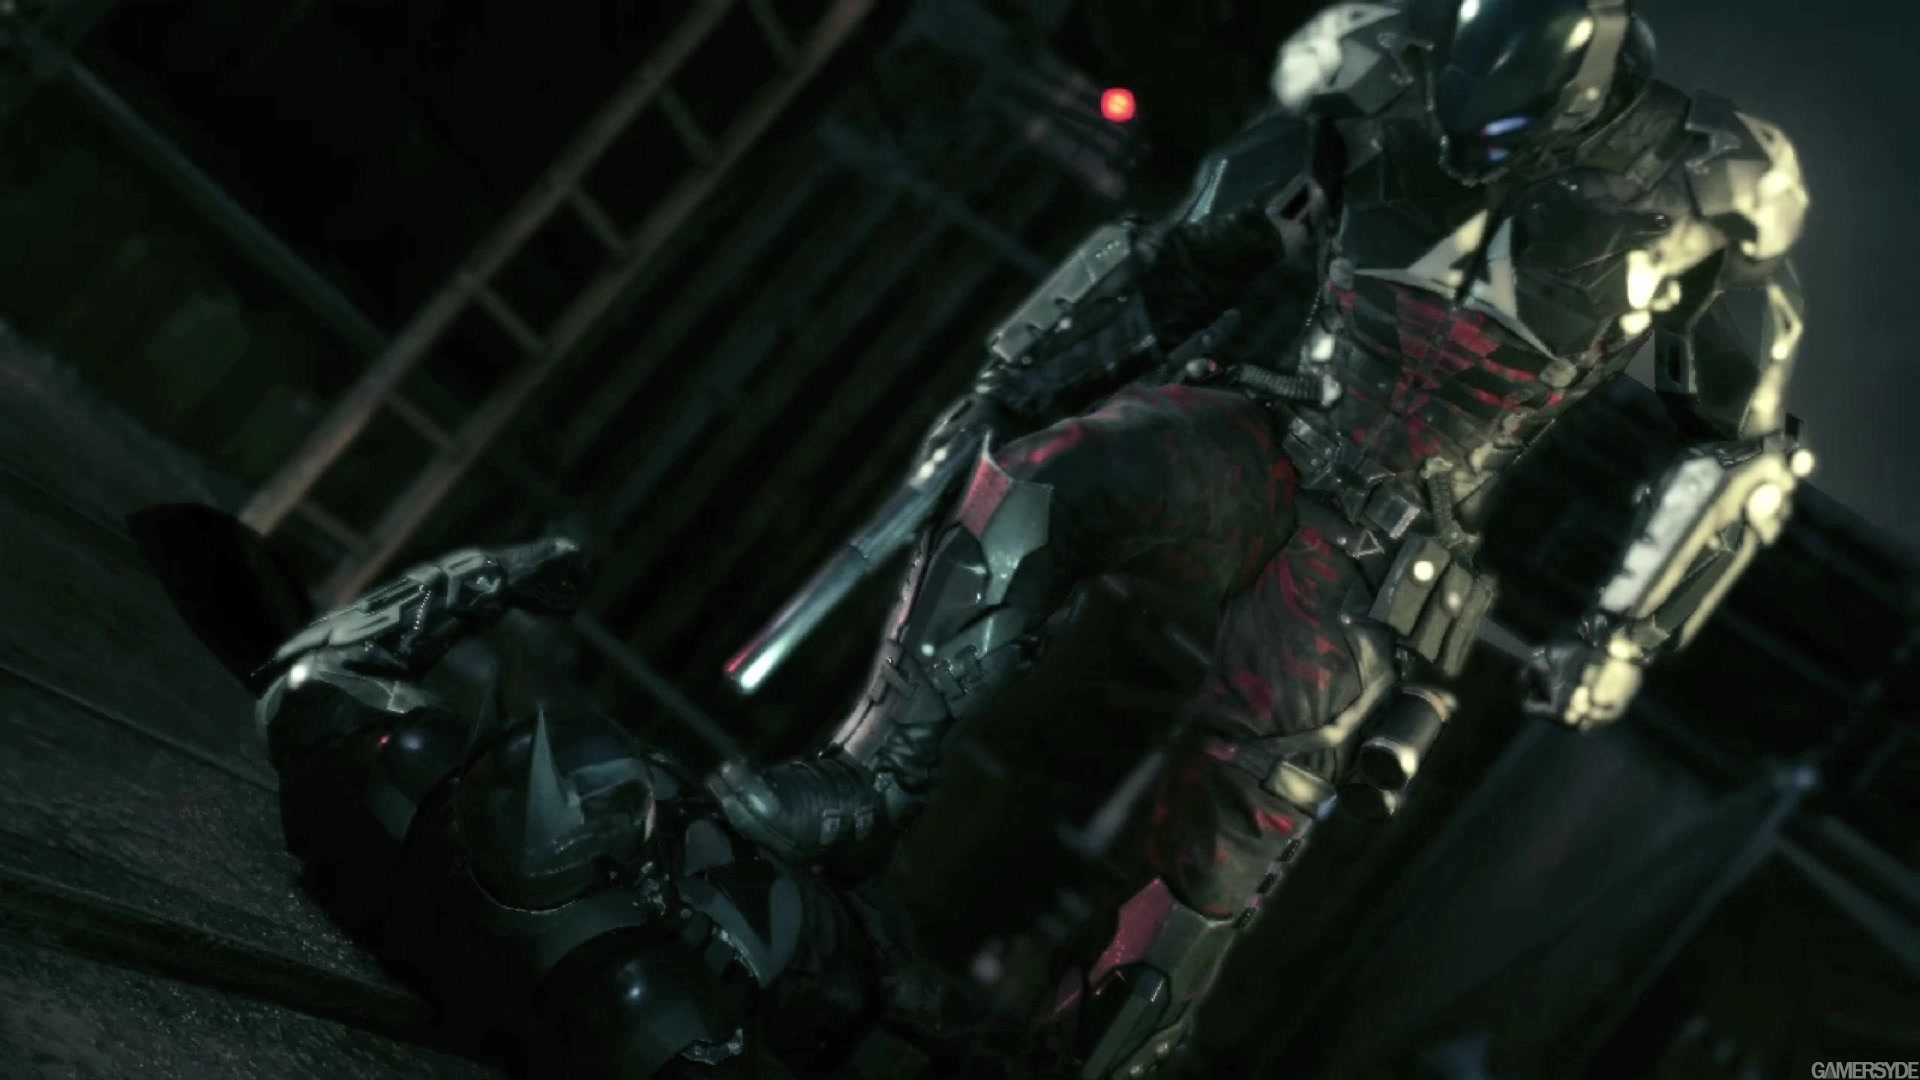 image batman arkham knight 25050 2899 0015 اولین تریلر گیم پلی Batman : Arkham Knight منتشر شد : حماسه ی نهایی